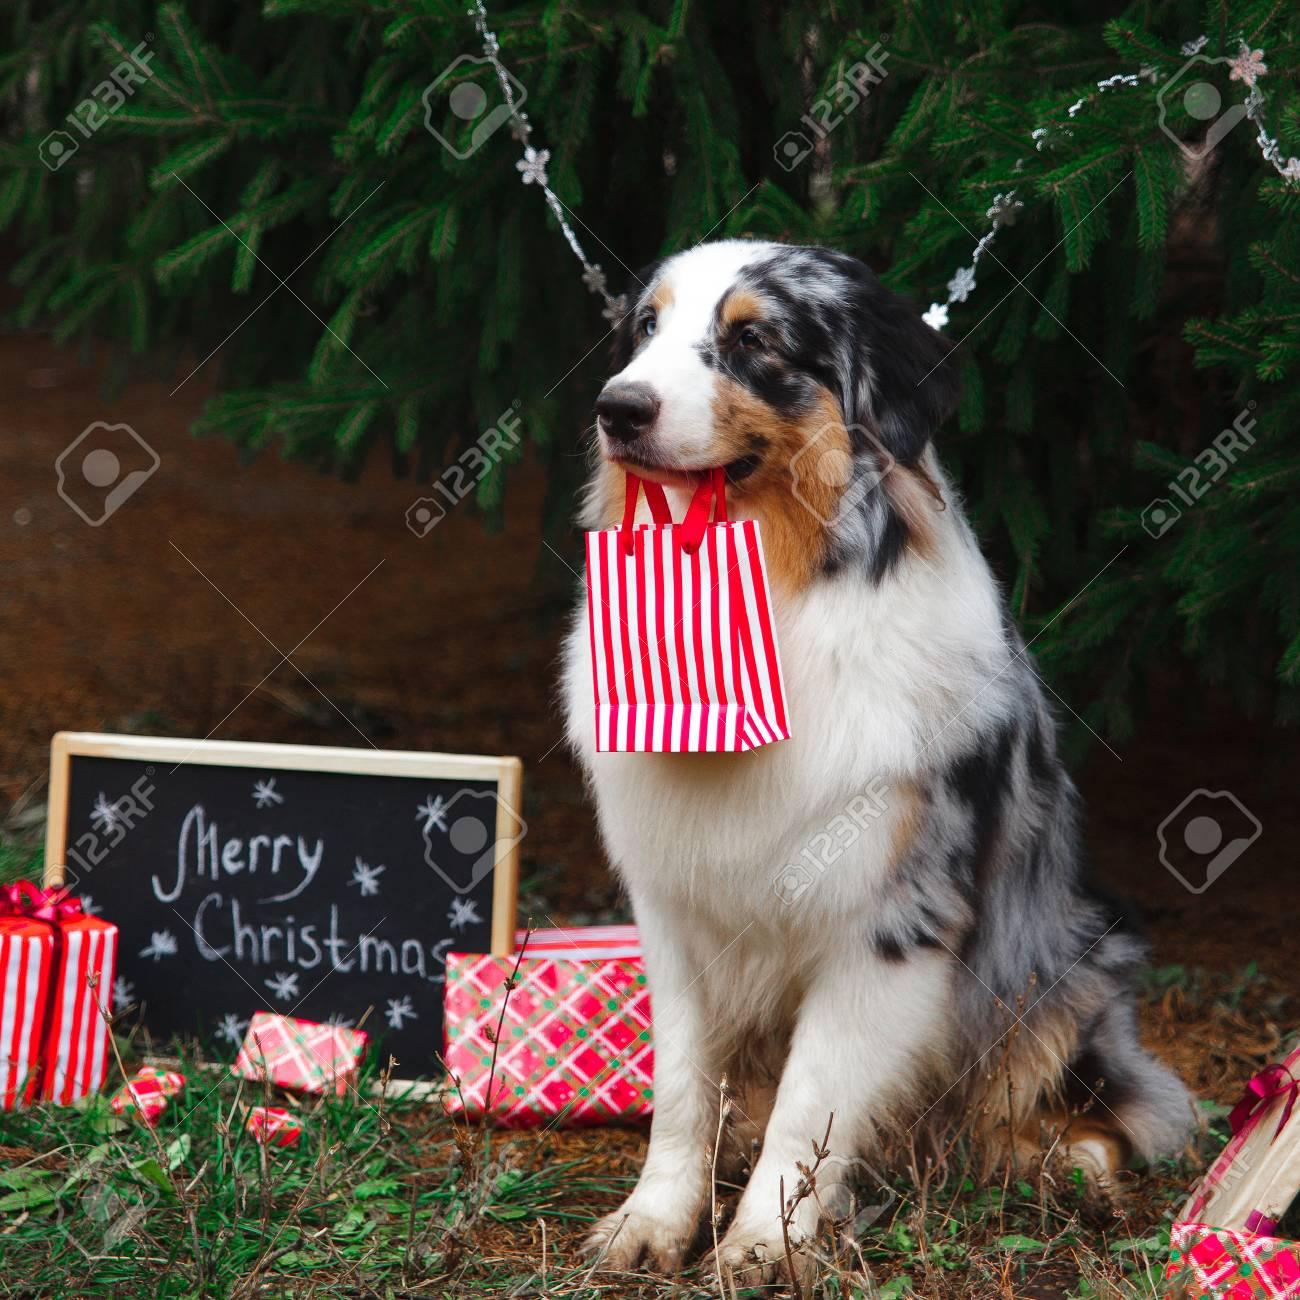 The Christmas Shepherd.Australian Shepherd Holding A Gift Bag In The Mouth Sitting Under